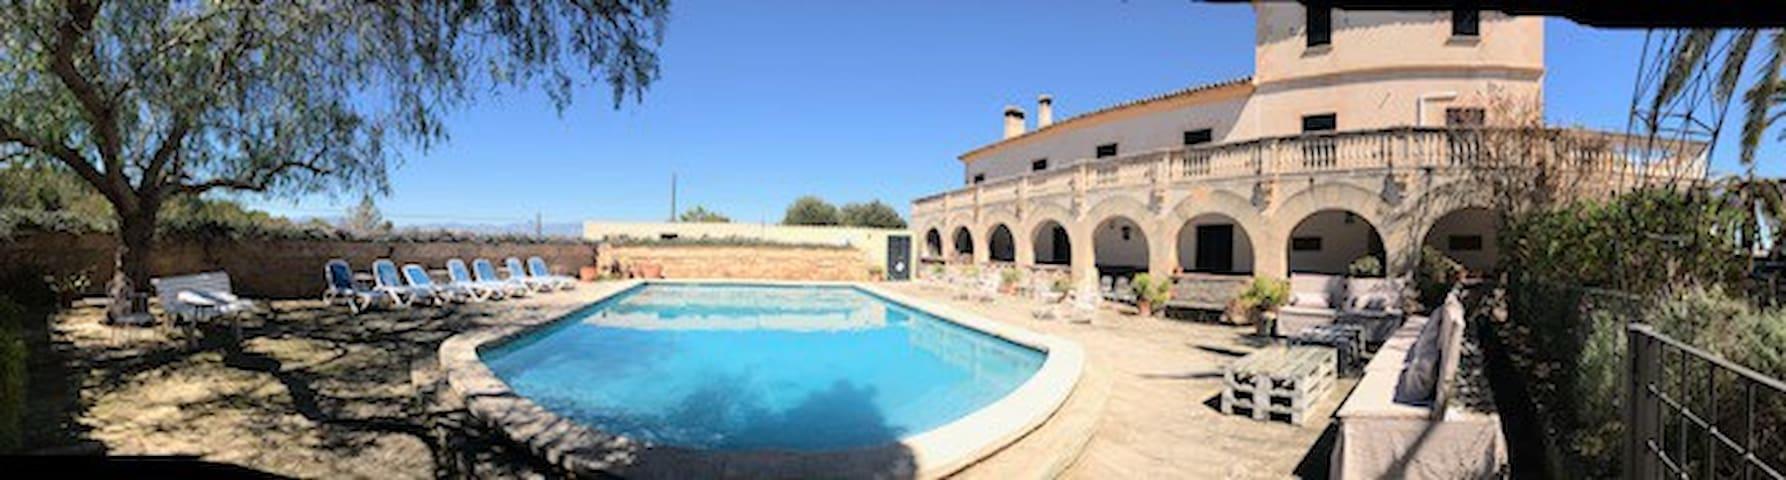 Bonita, luminosa planta baja con piscina